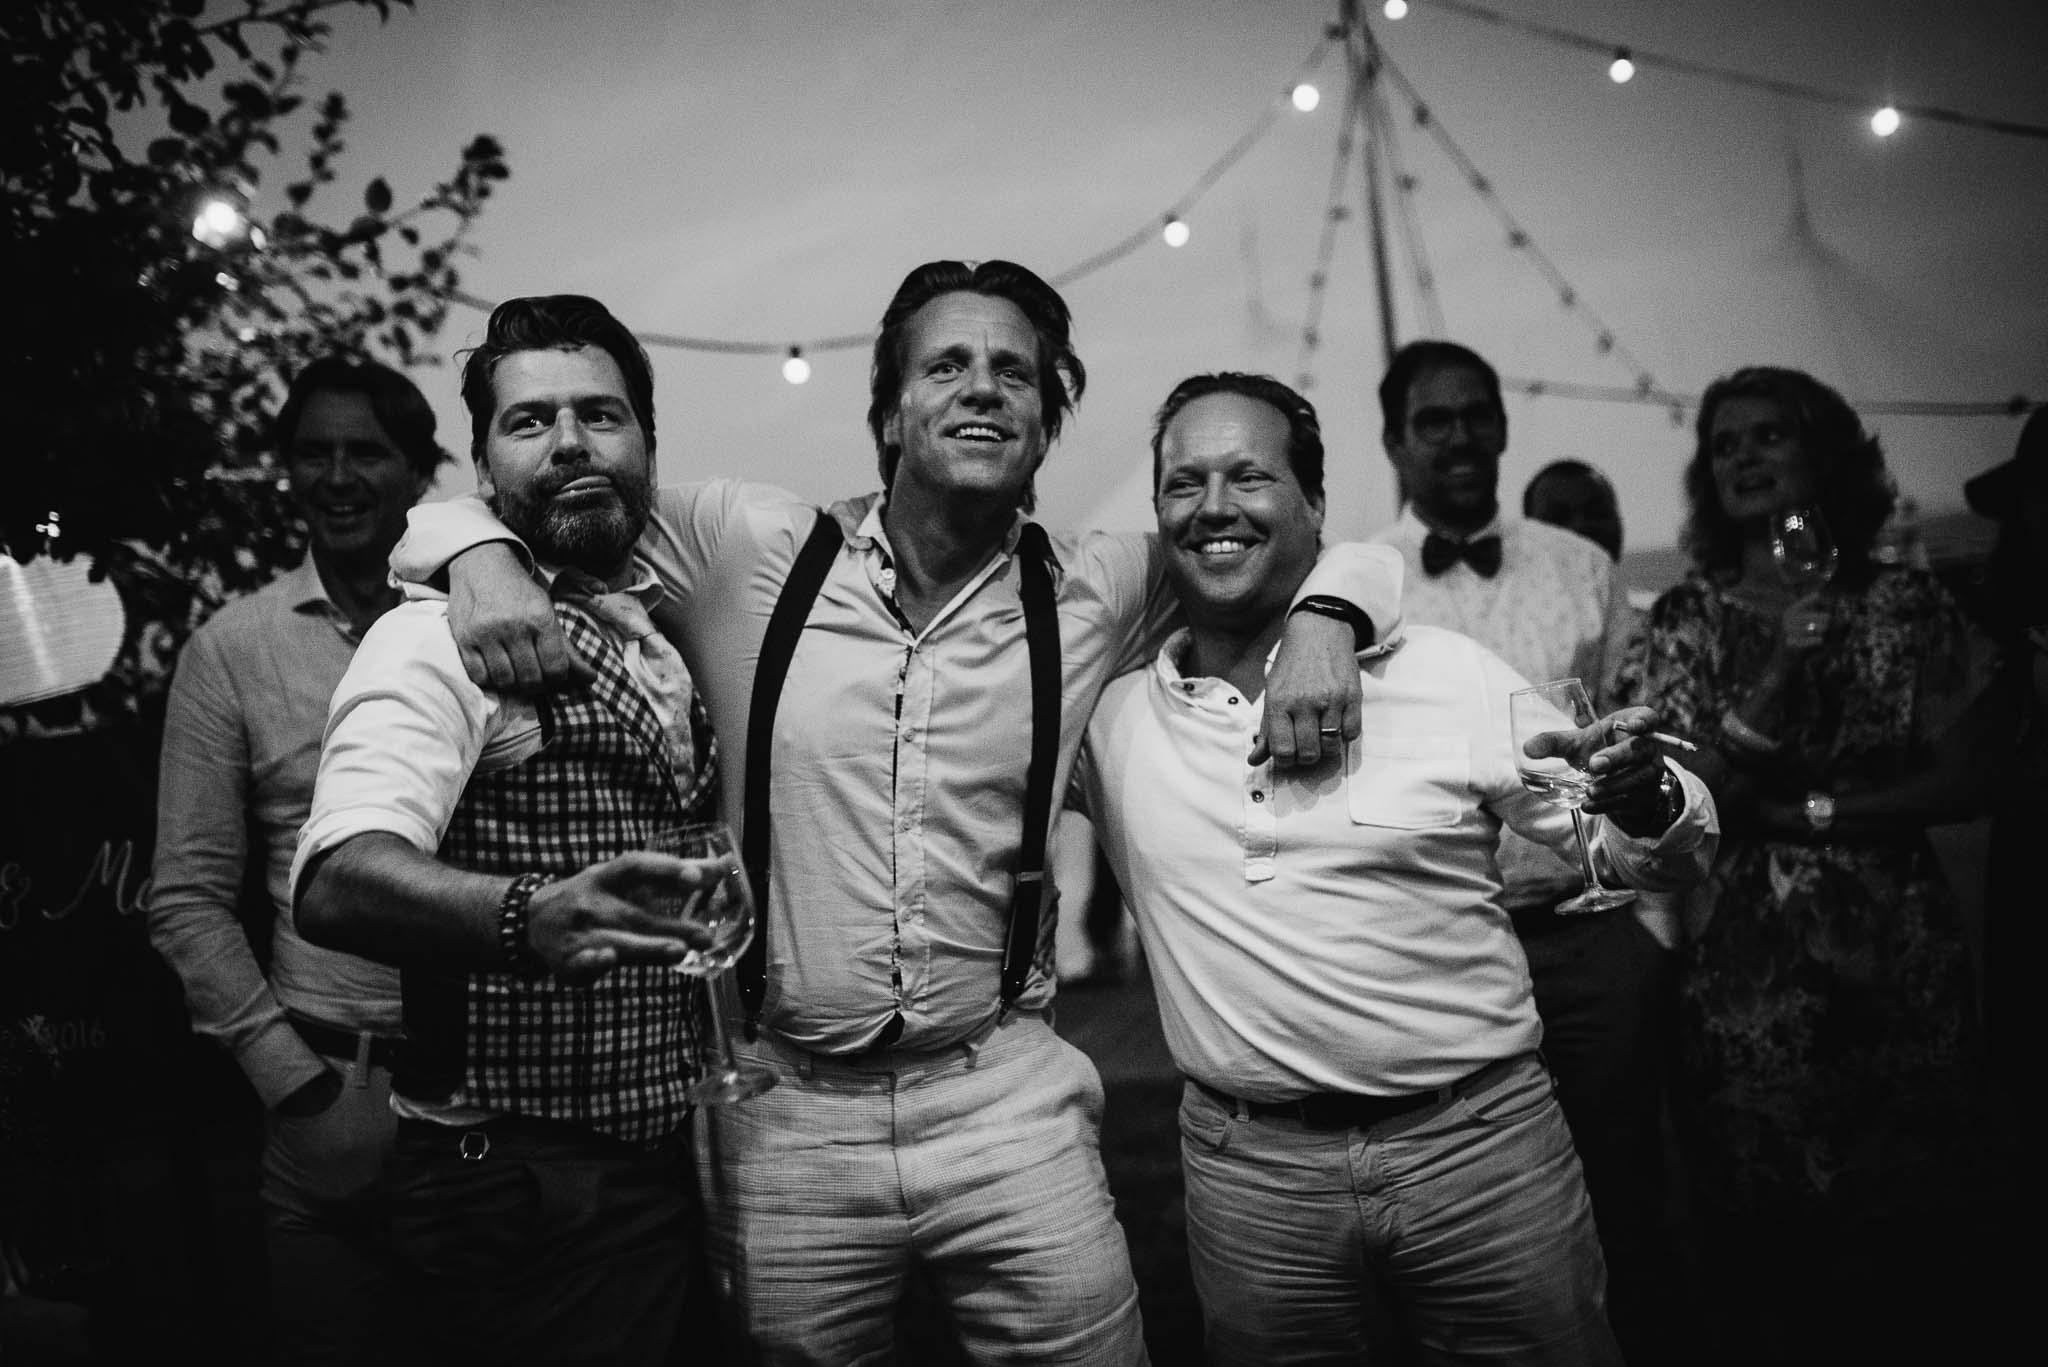 bohemian bruiloft festival stijl weiland spontane foto's